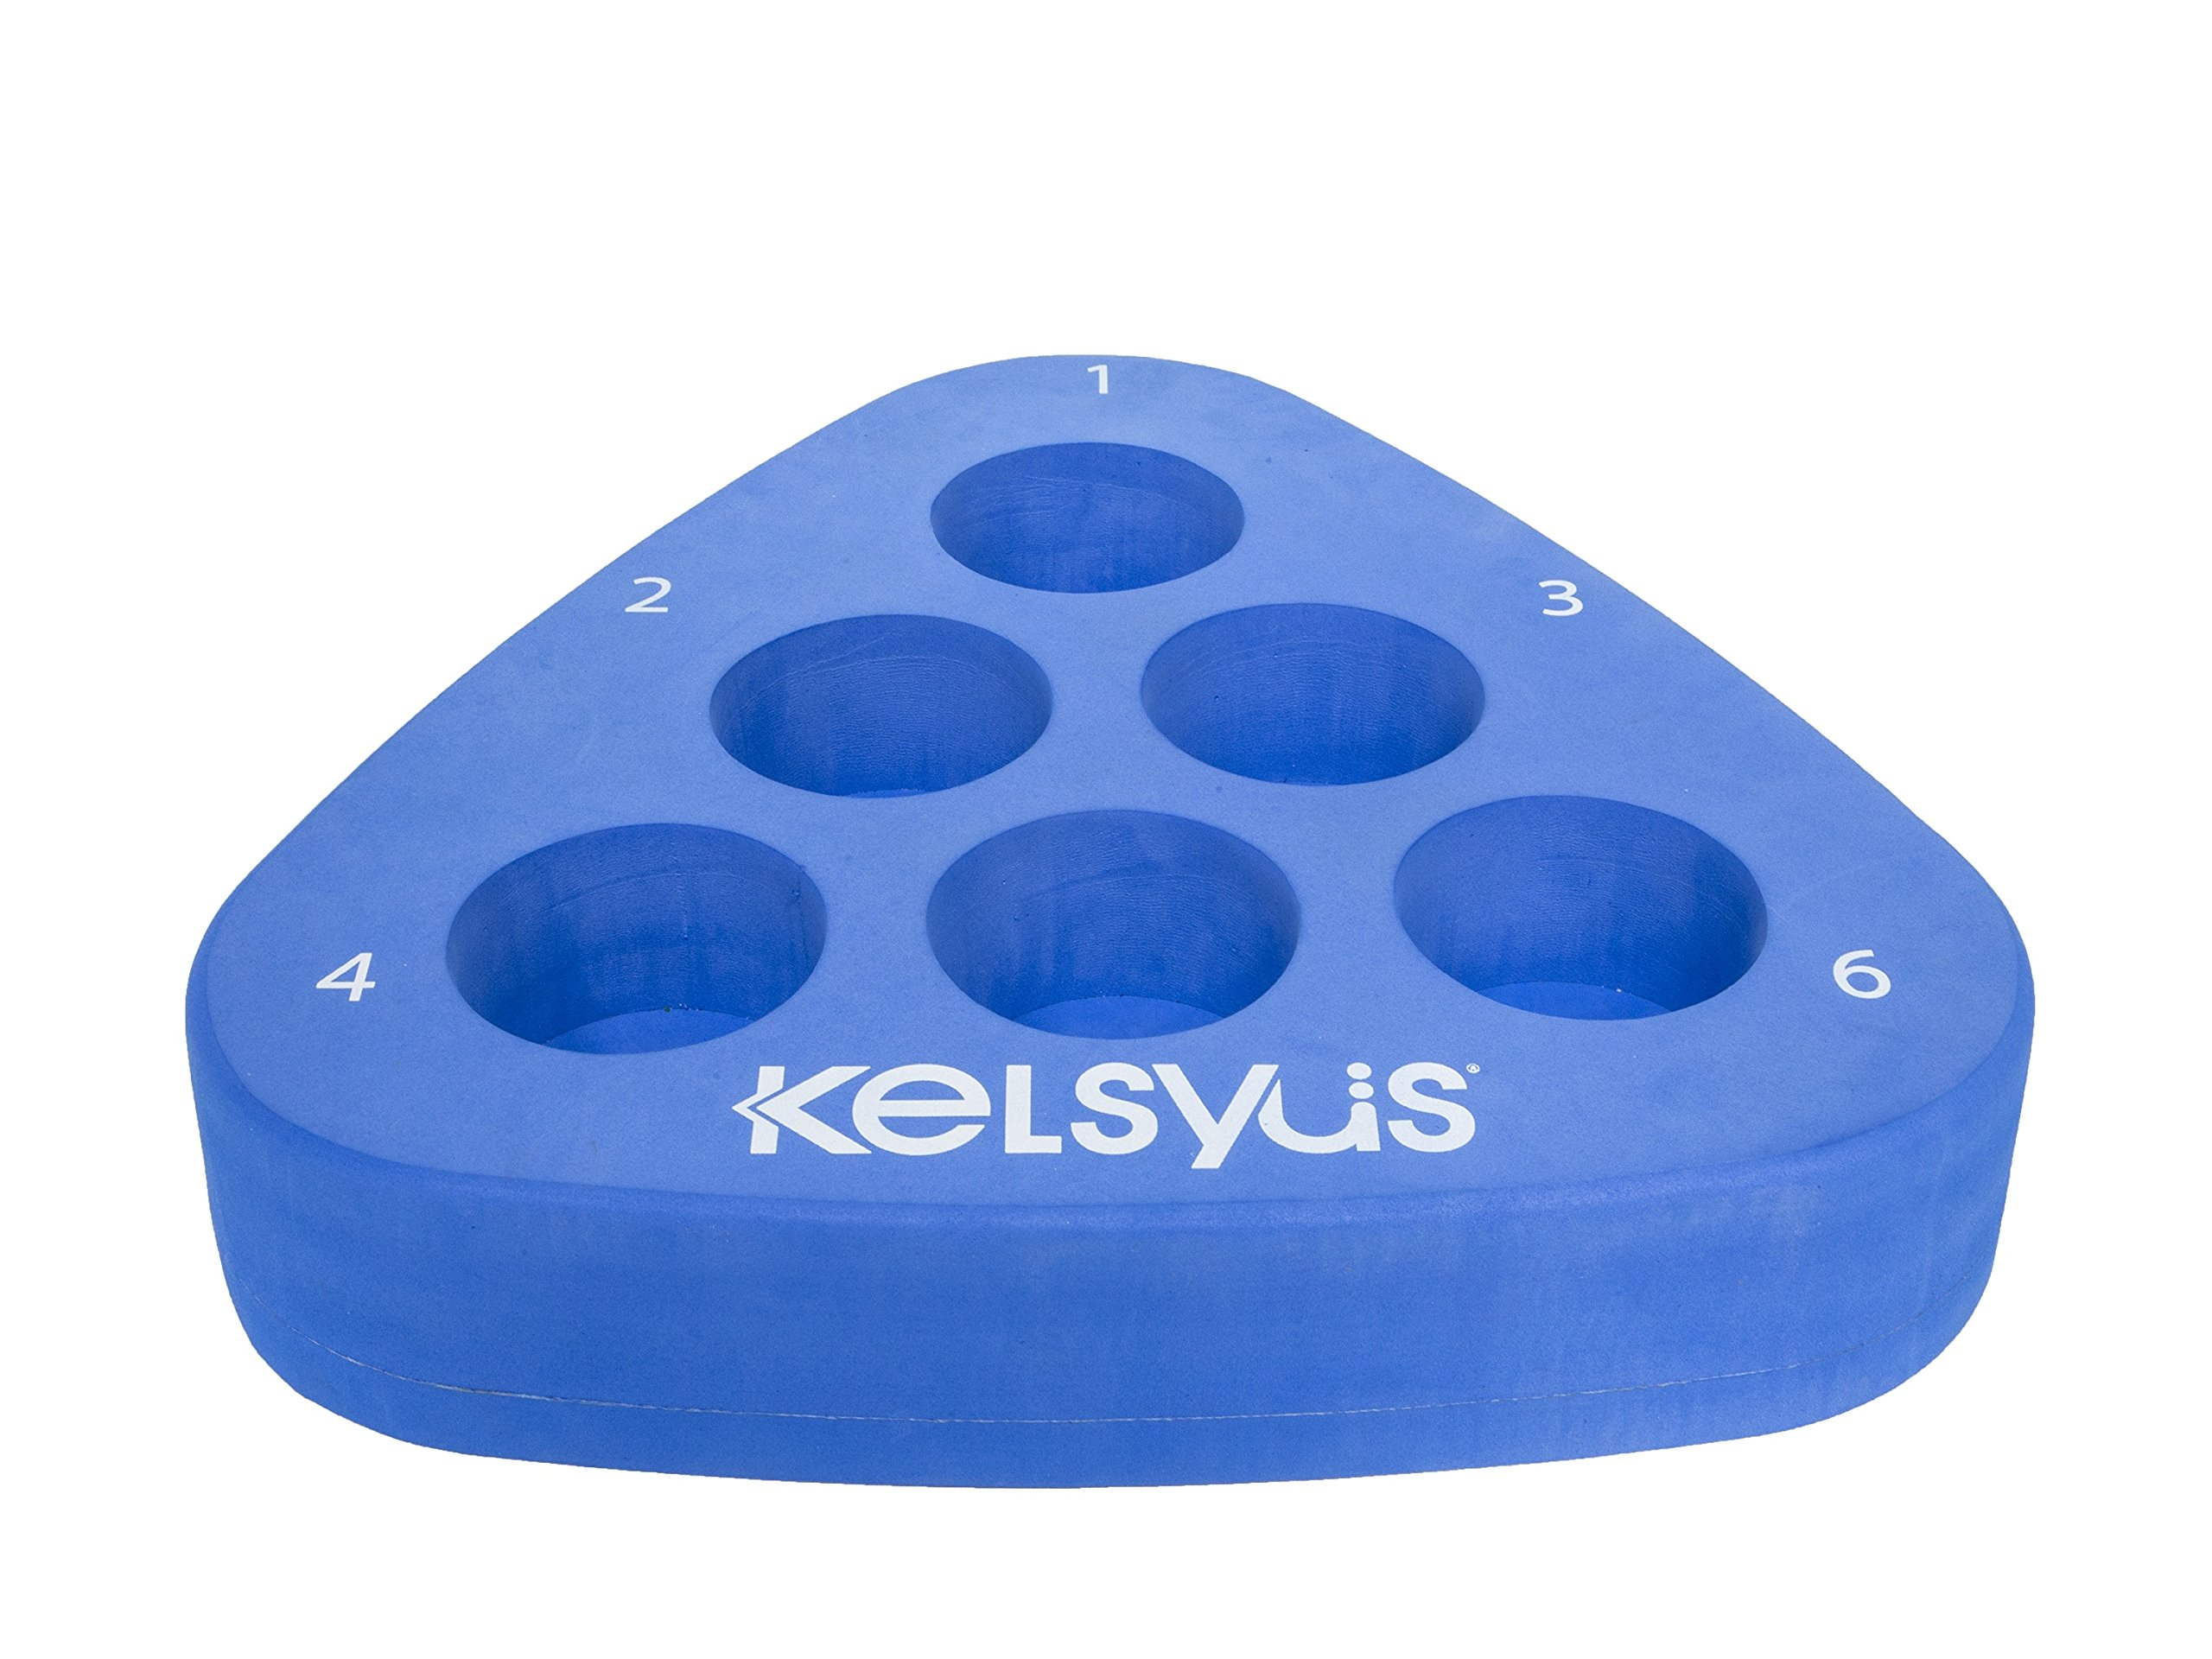 Kelsyus Premium Floating Pong